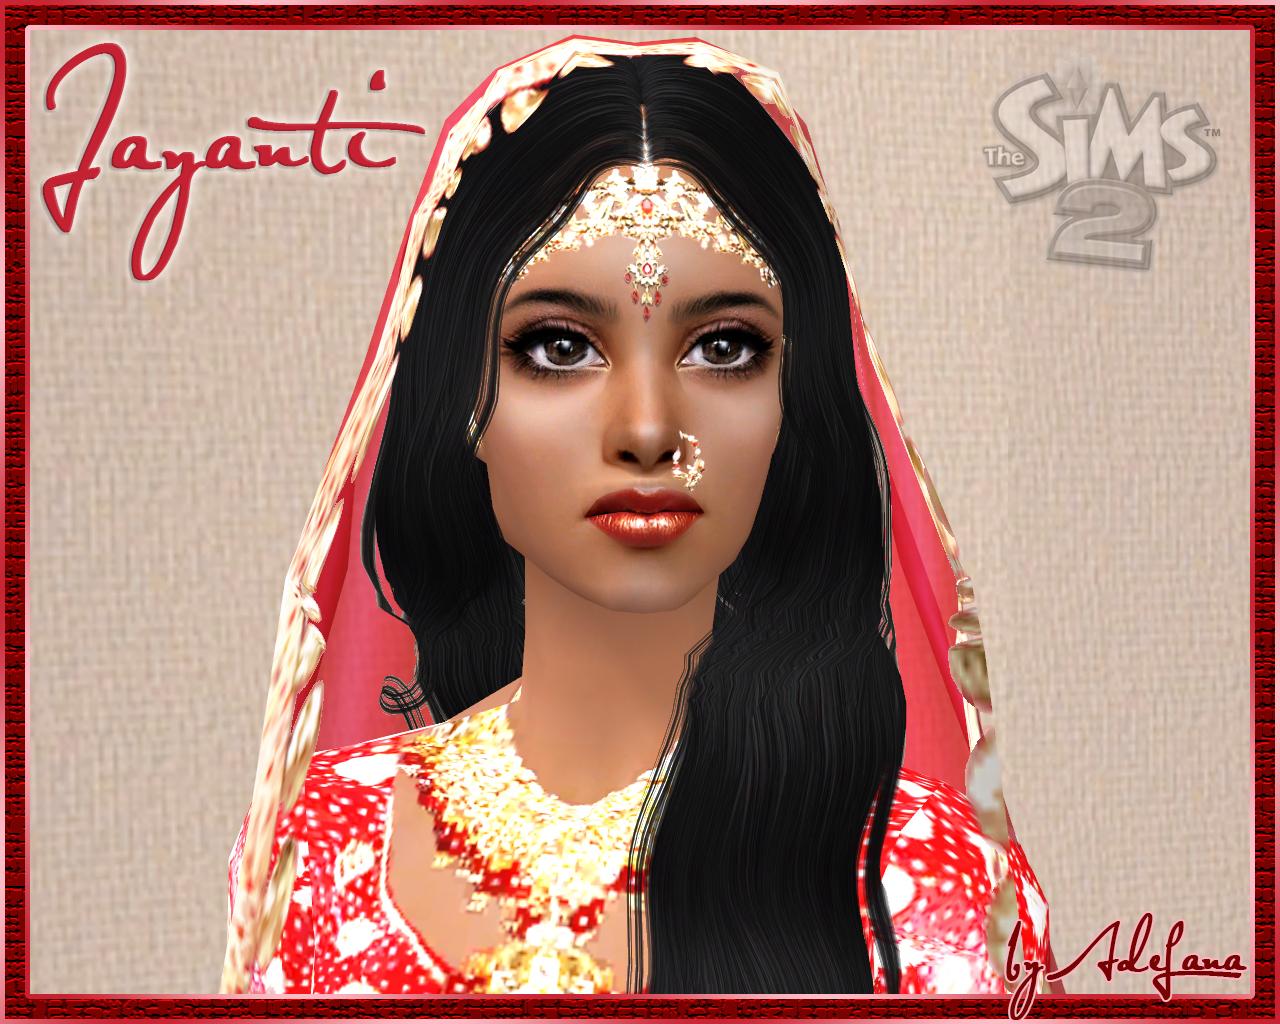 MTS_AdeLanaSP-1919618-India_00.jpg